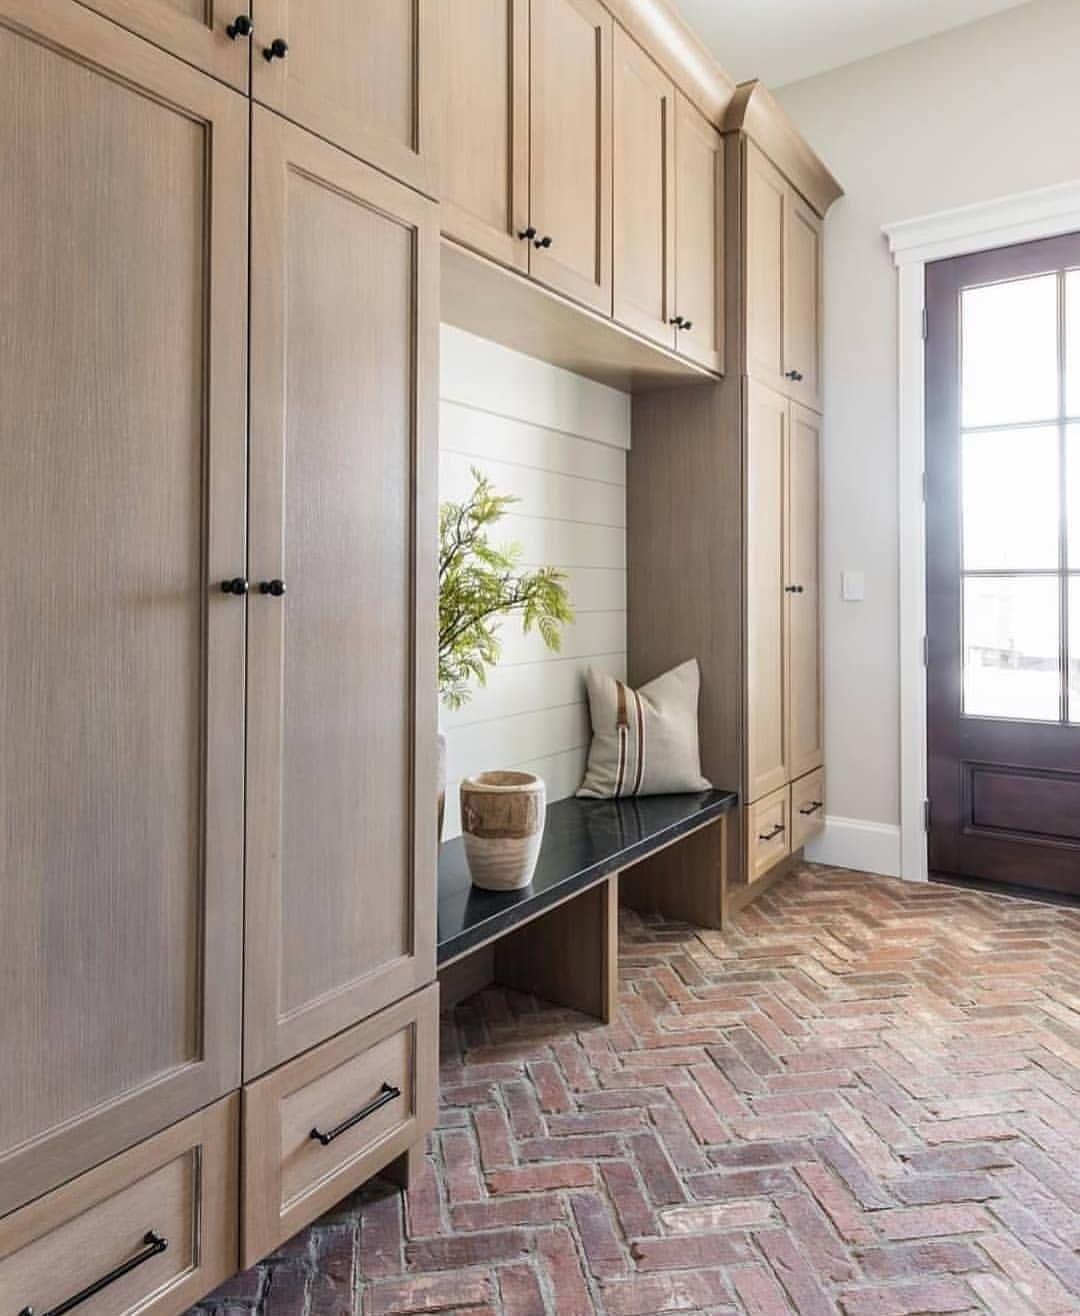 Sea Interior Design On Instagram Can T Get Enough Of This Herringbone Brick Floor In This Stunning Mudroom Mudroom Design Mudroom Flooring Built In Lockers